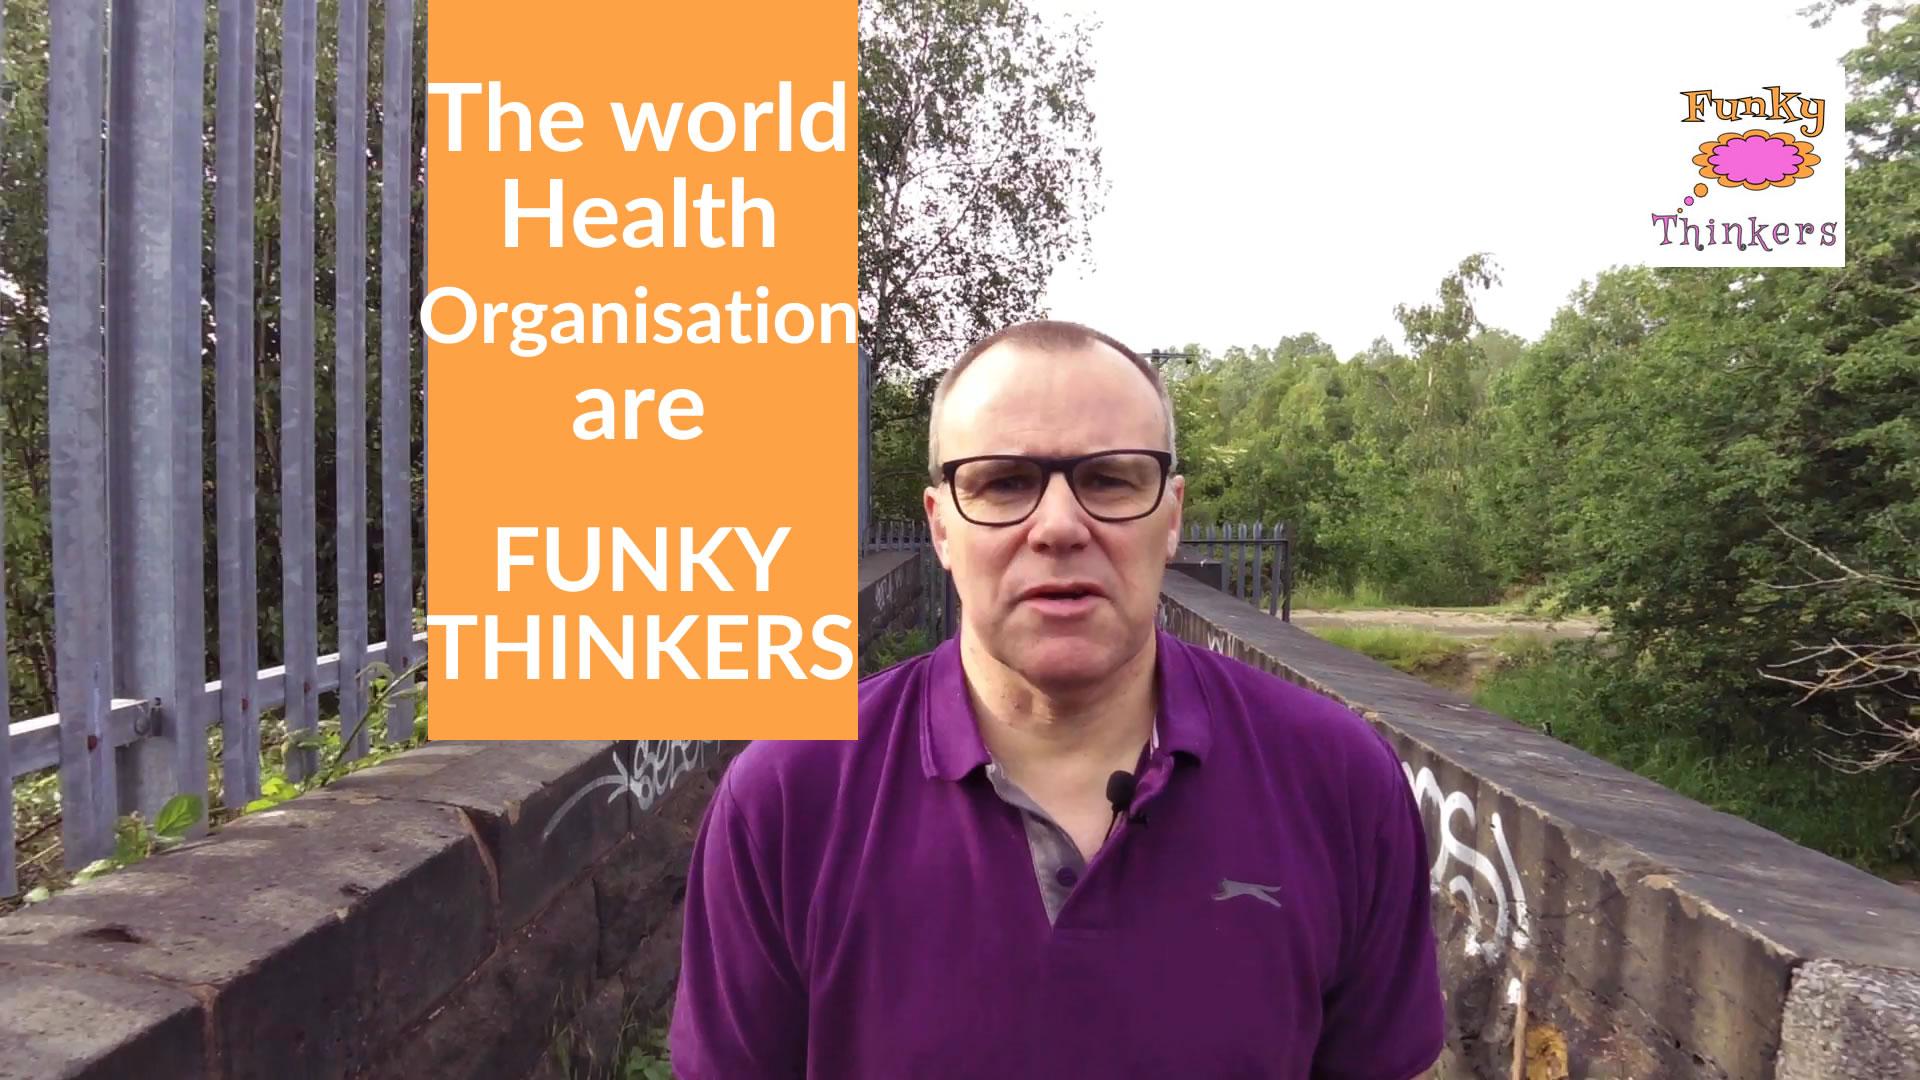 The world health organisation